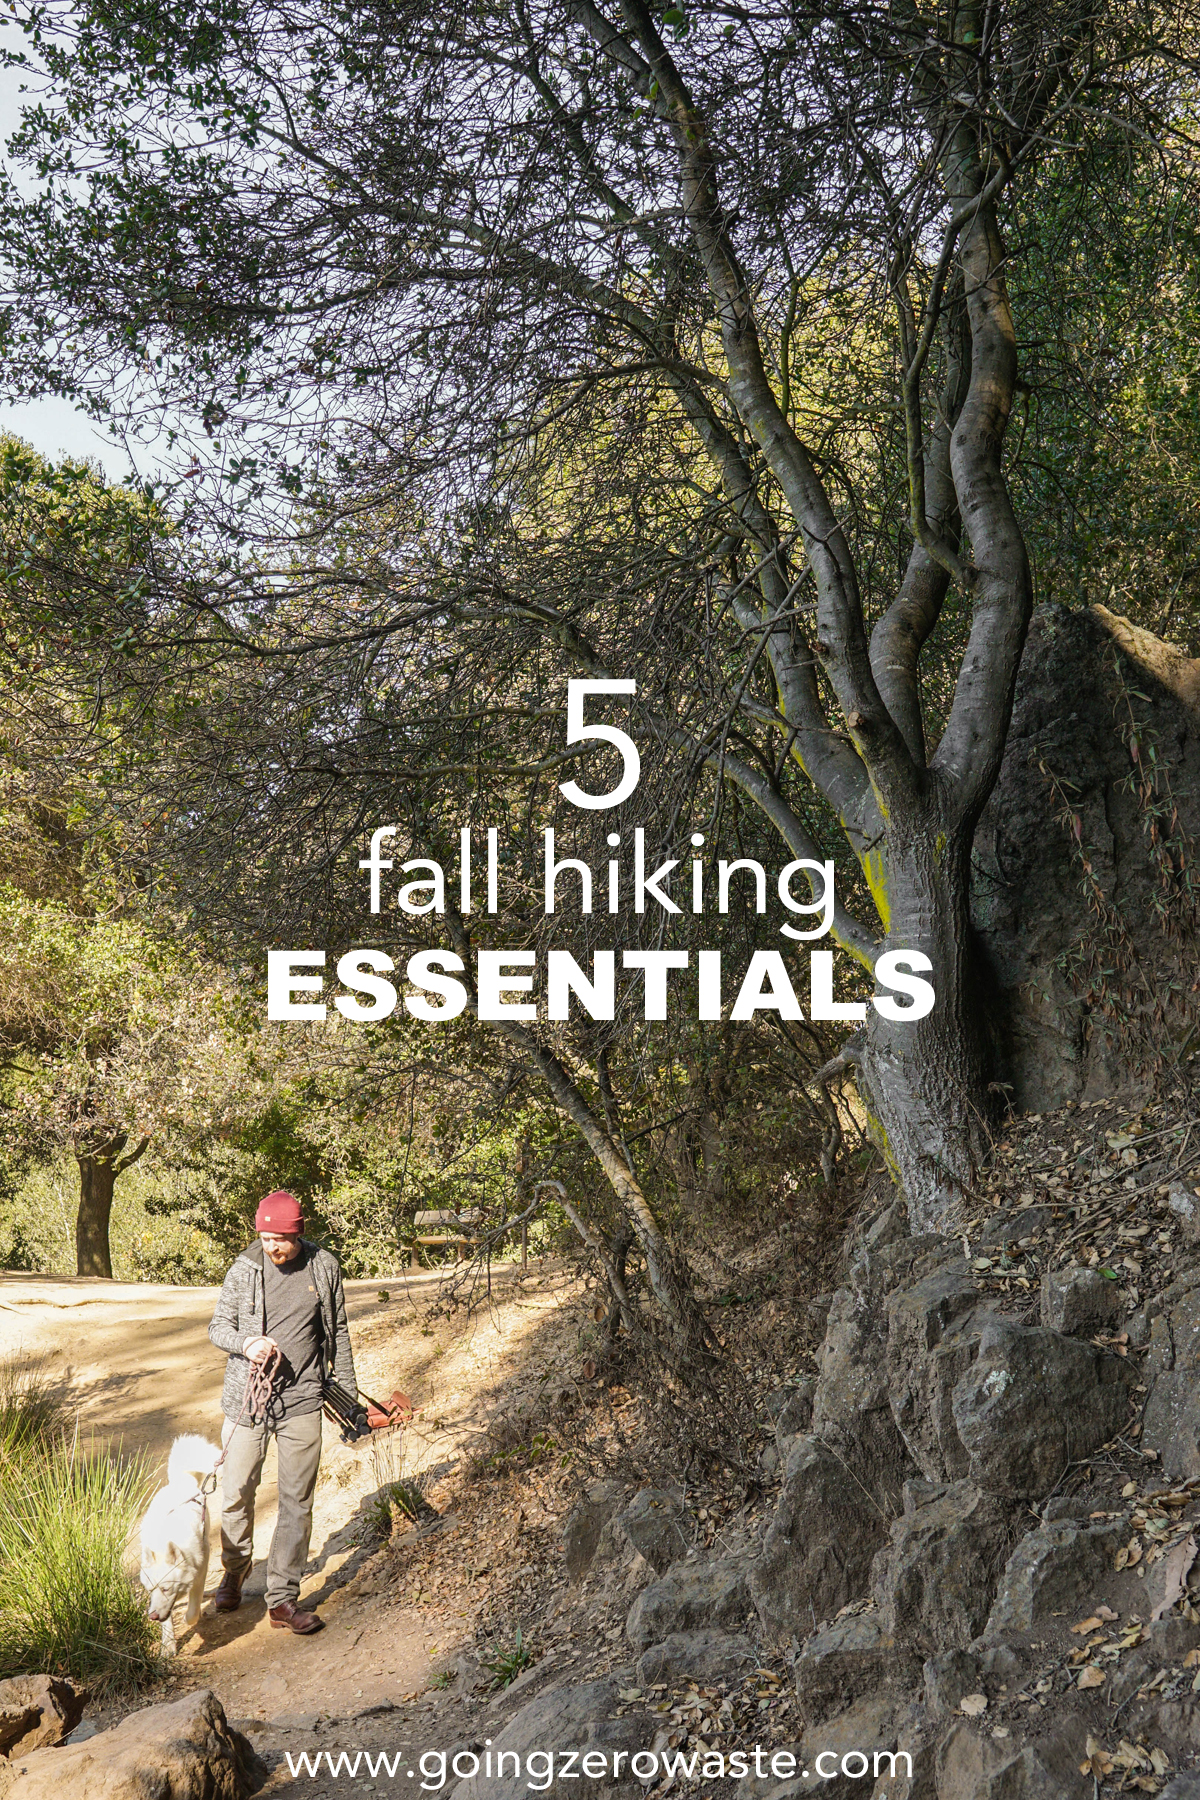 Five fall hiking essentials from www.goingzerowaste.com #hiking #fall